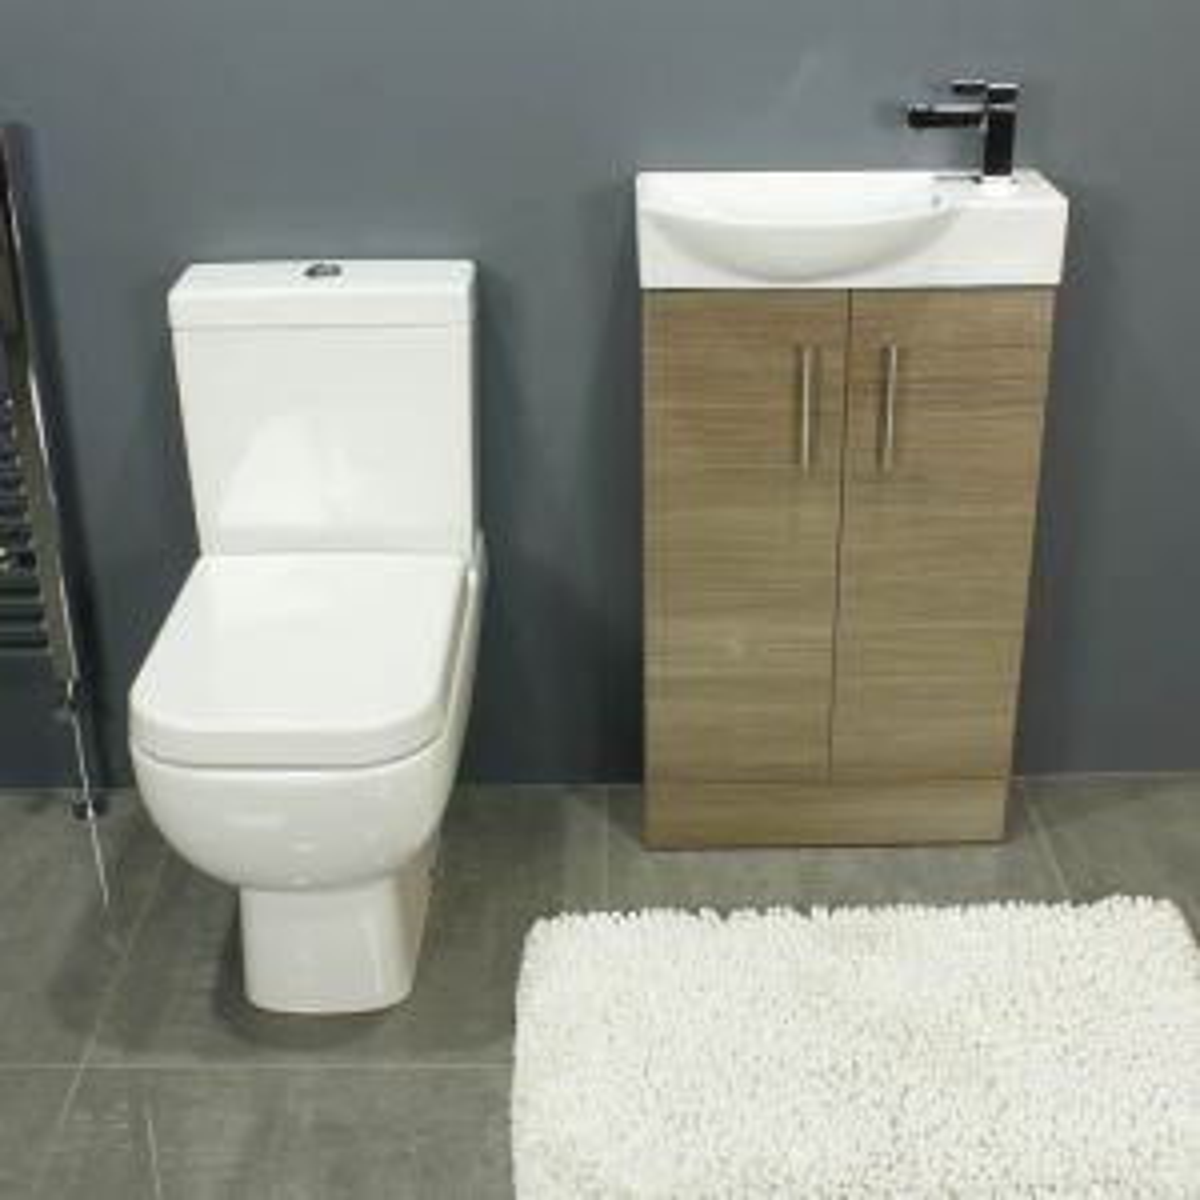 RAK Series 600 Close Coupled Toilet and 500 Series Mini Medium Oak Double Door Vanity Unit Front